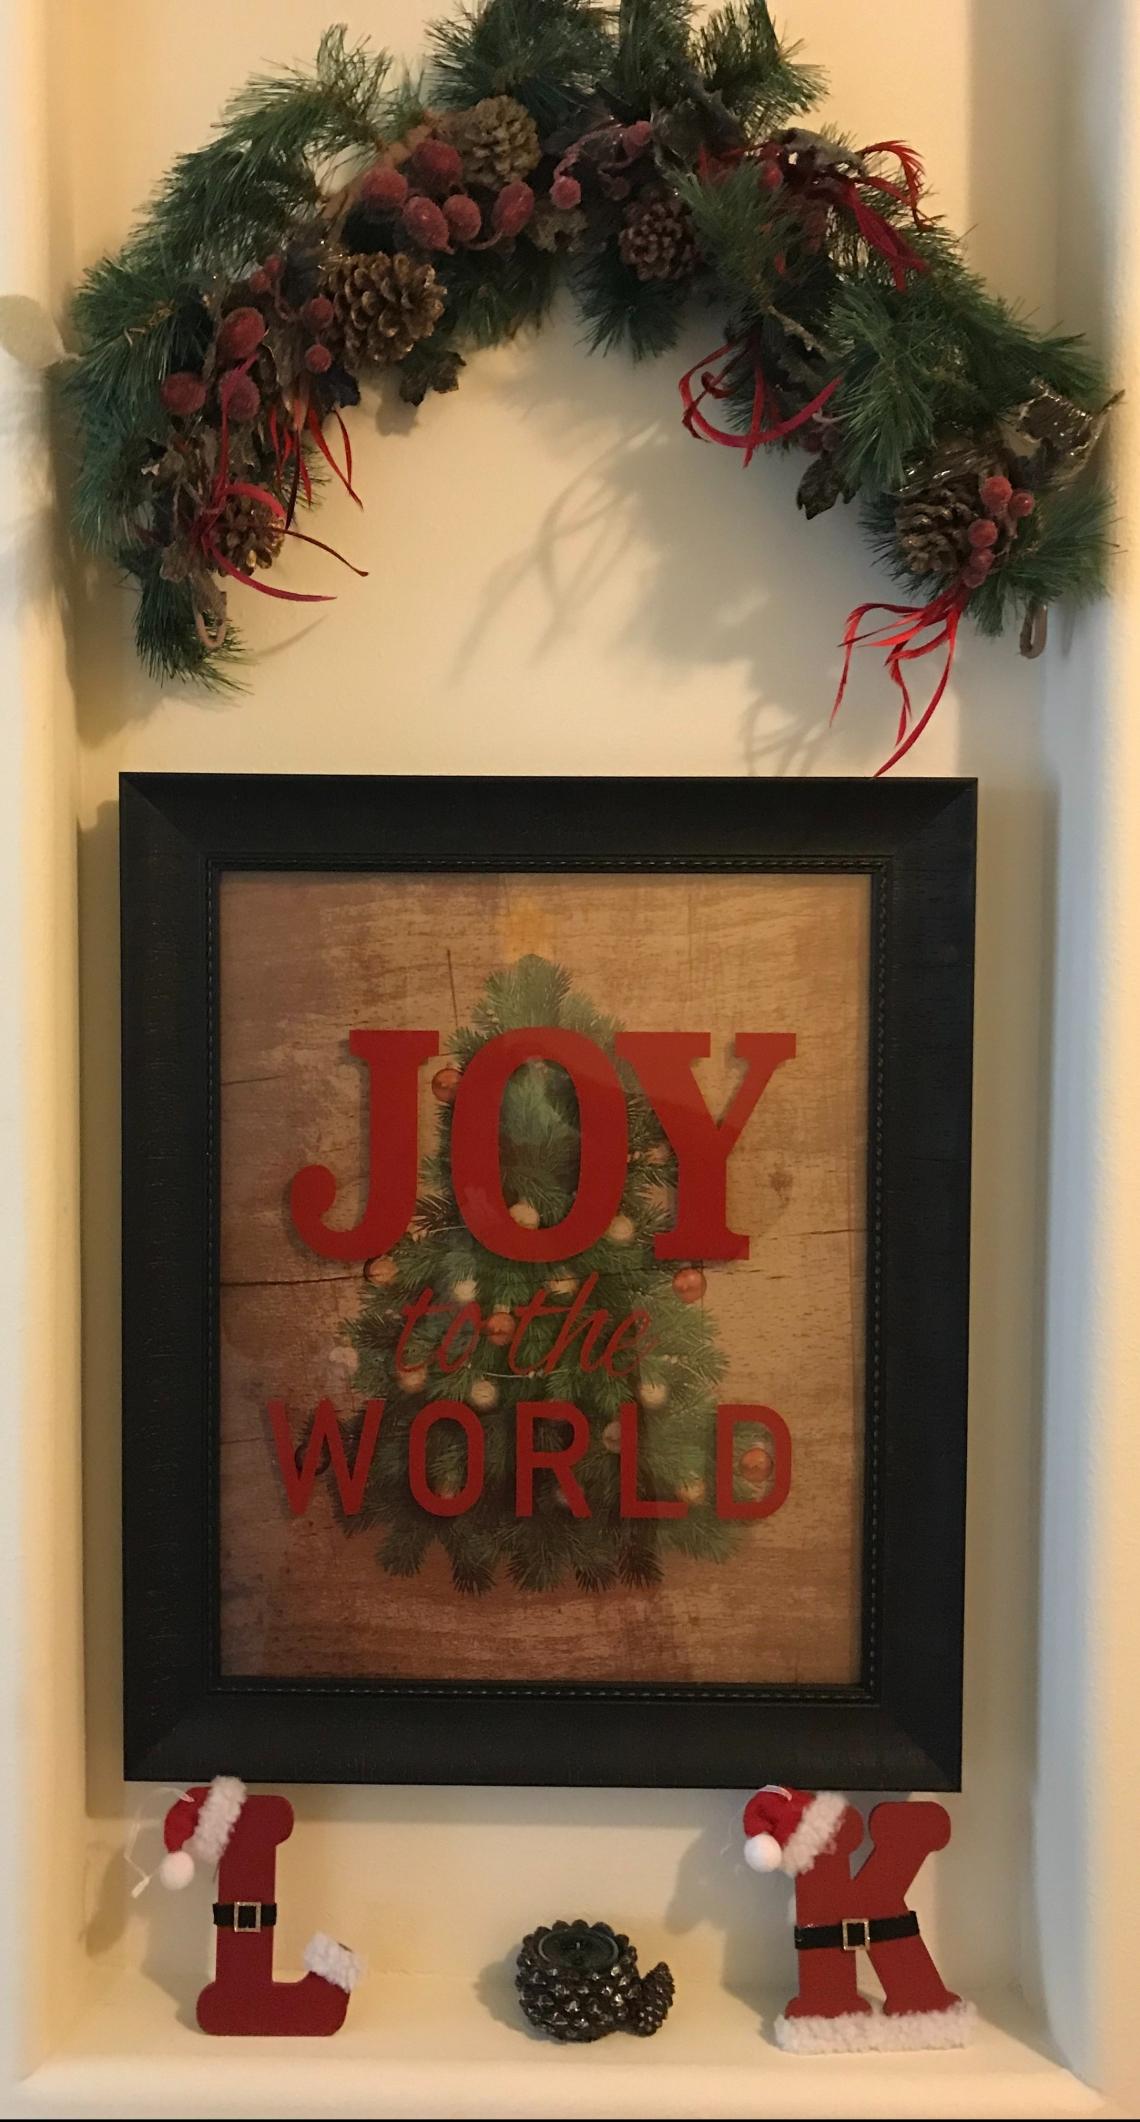 joy-to-the-world-2017.jpg